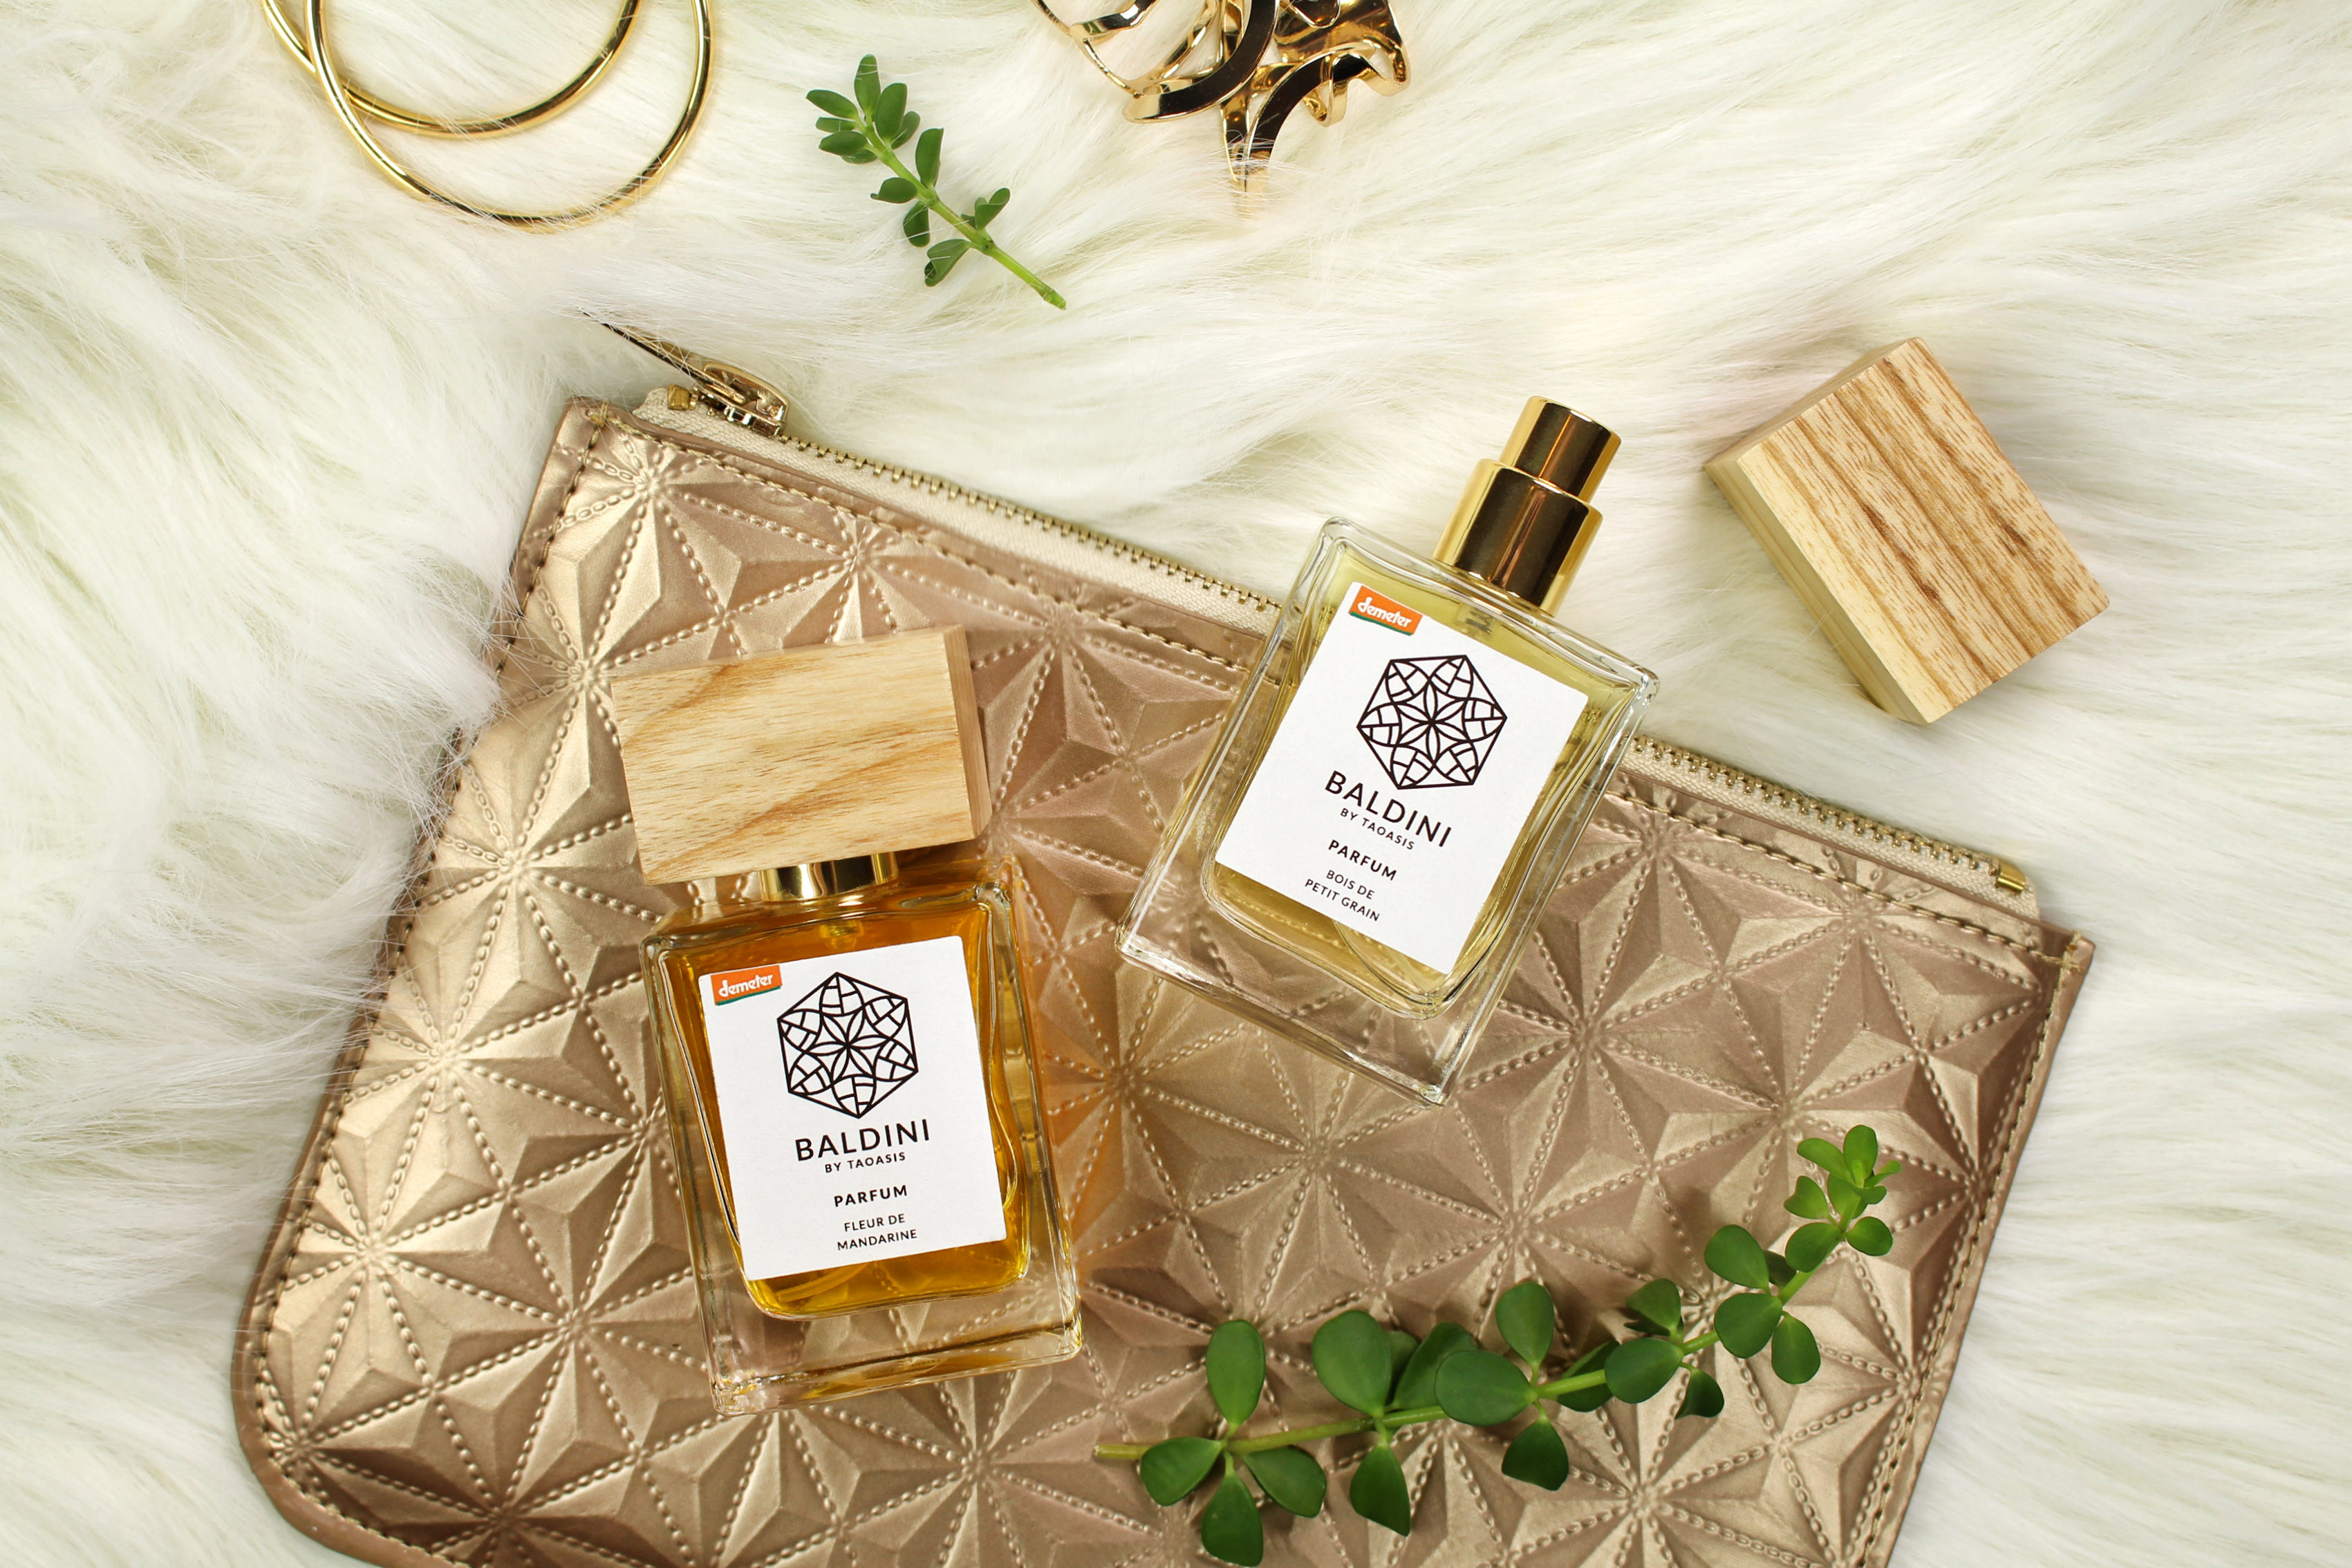 demeter-naturparfum-taoasis-baldini